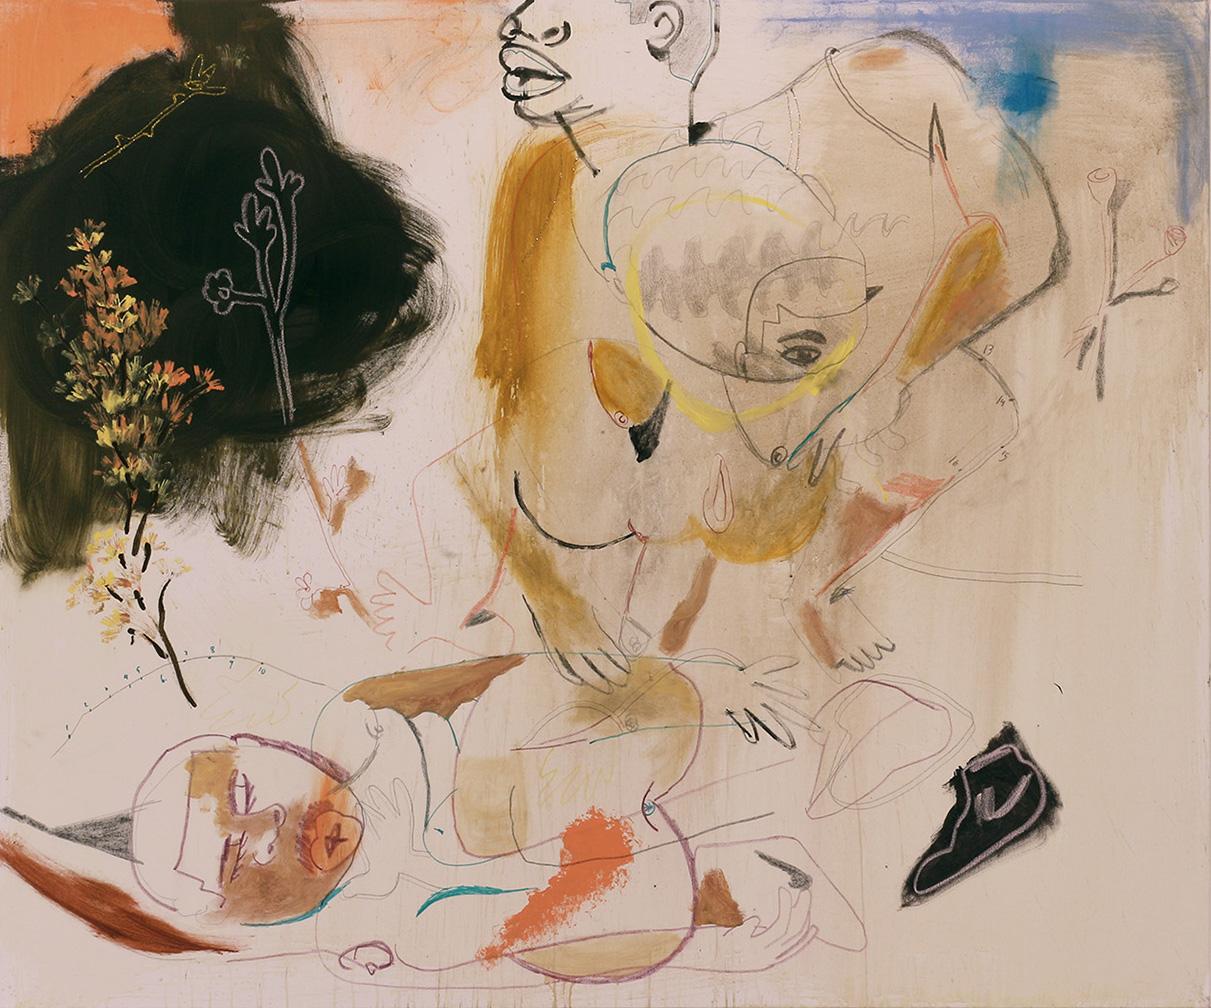 4 - Jonathan Lyndon Chase at Thierry Goldberg New York Gallery